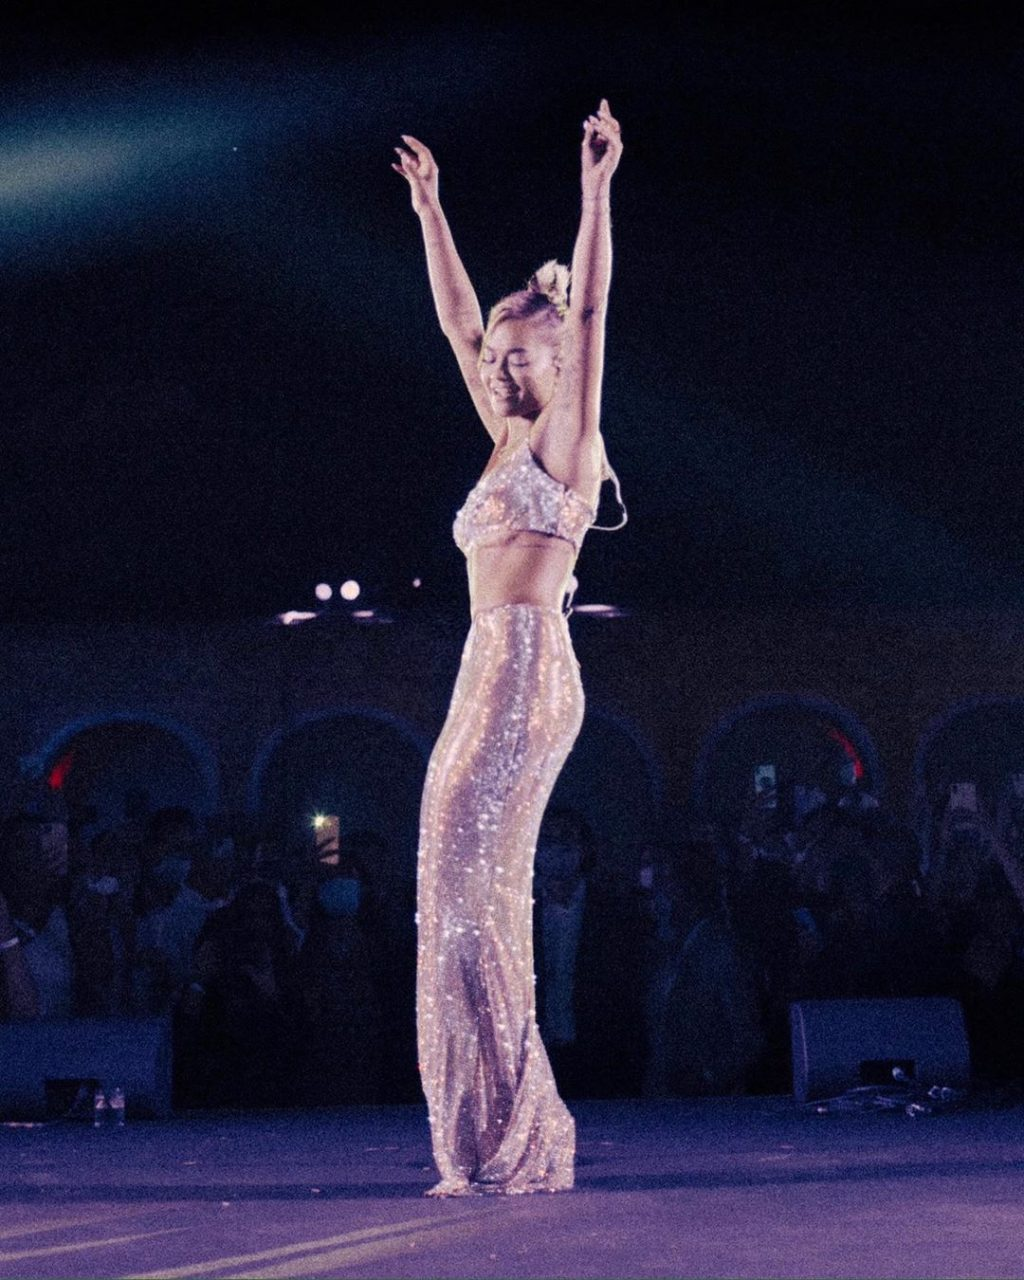 Rita Ora Performs for UNICEF Event (14 Photos)